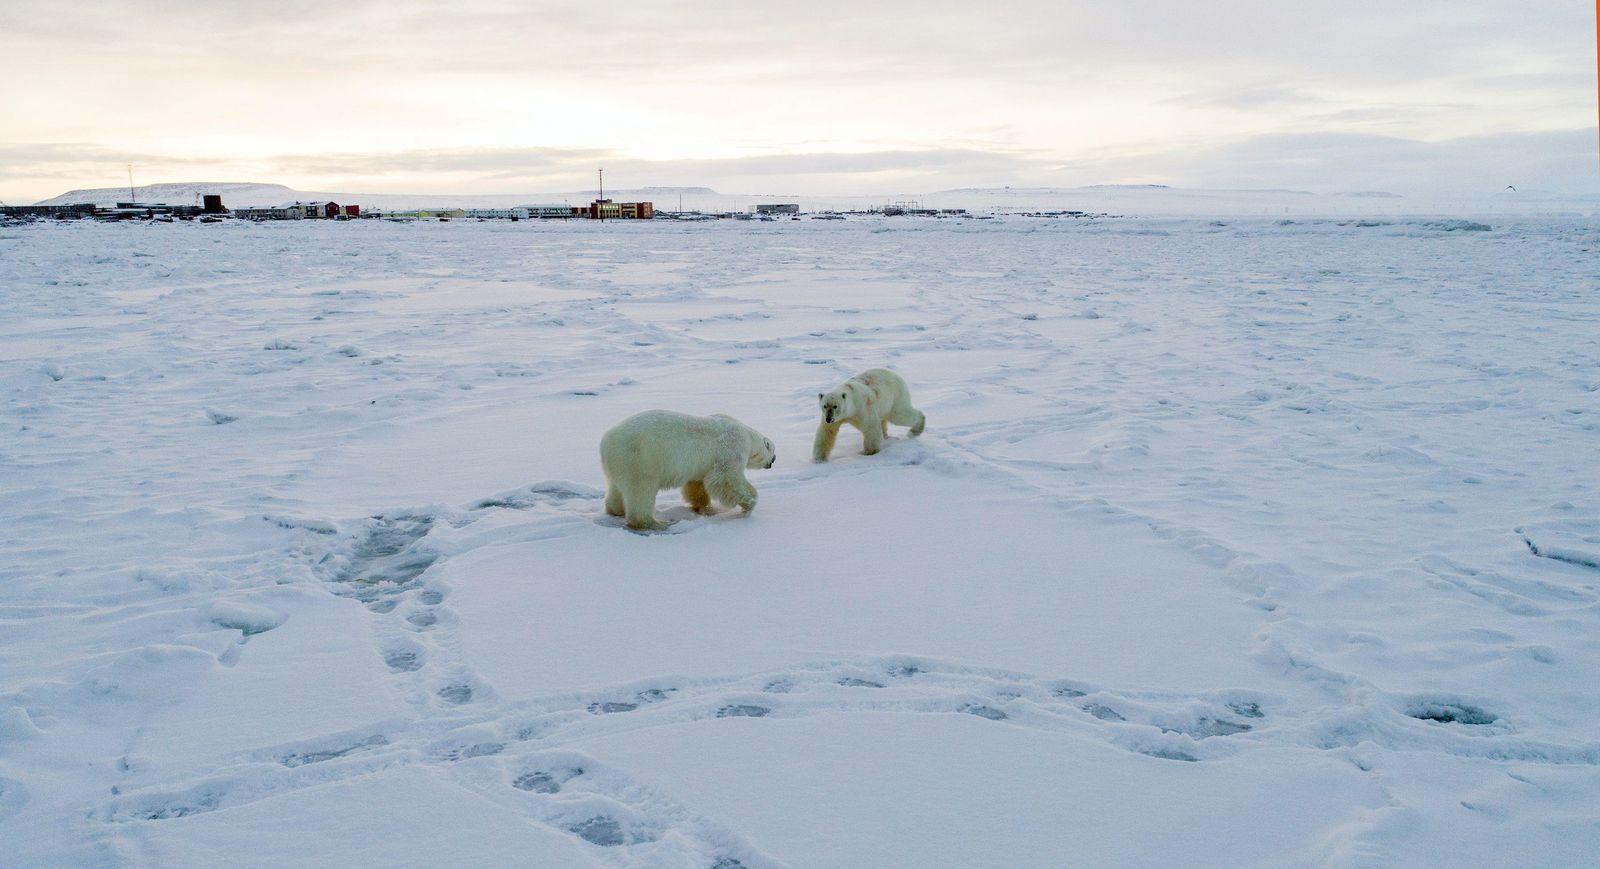 Hungrige Eisbären nähern sich Dorf am Nordpolarmeer